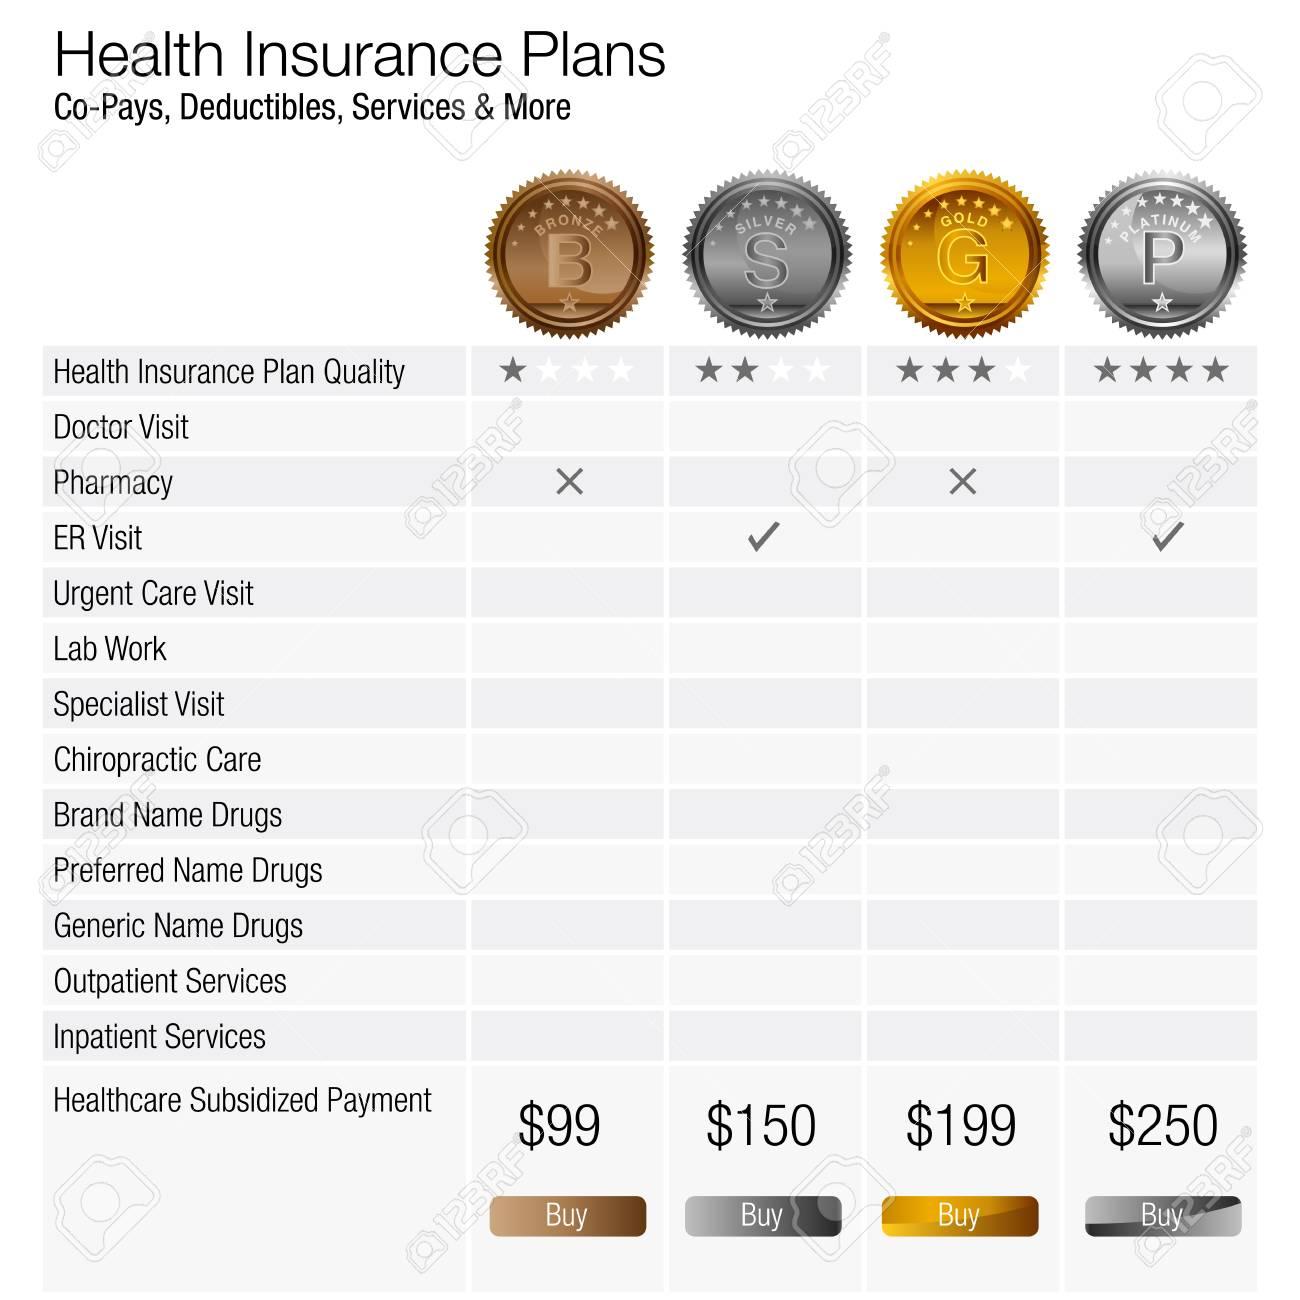 An image of a health insurance plan chart. - 96253227